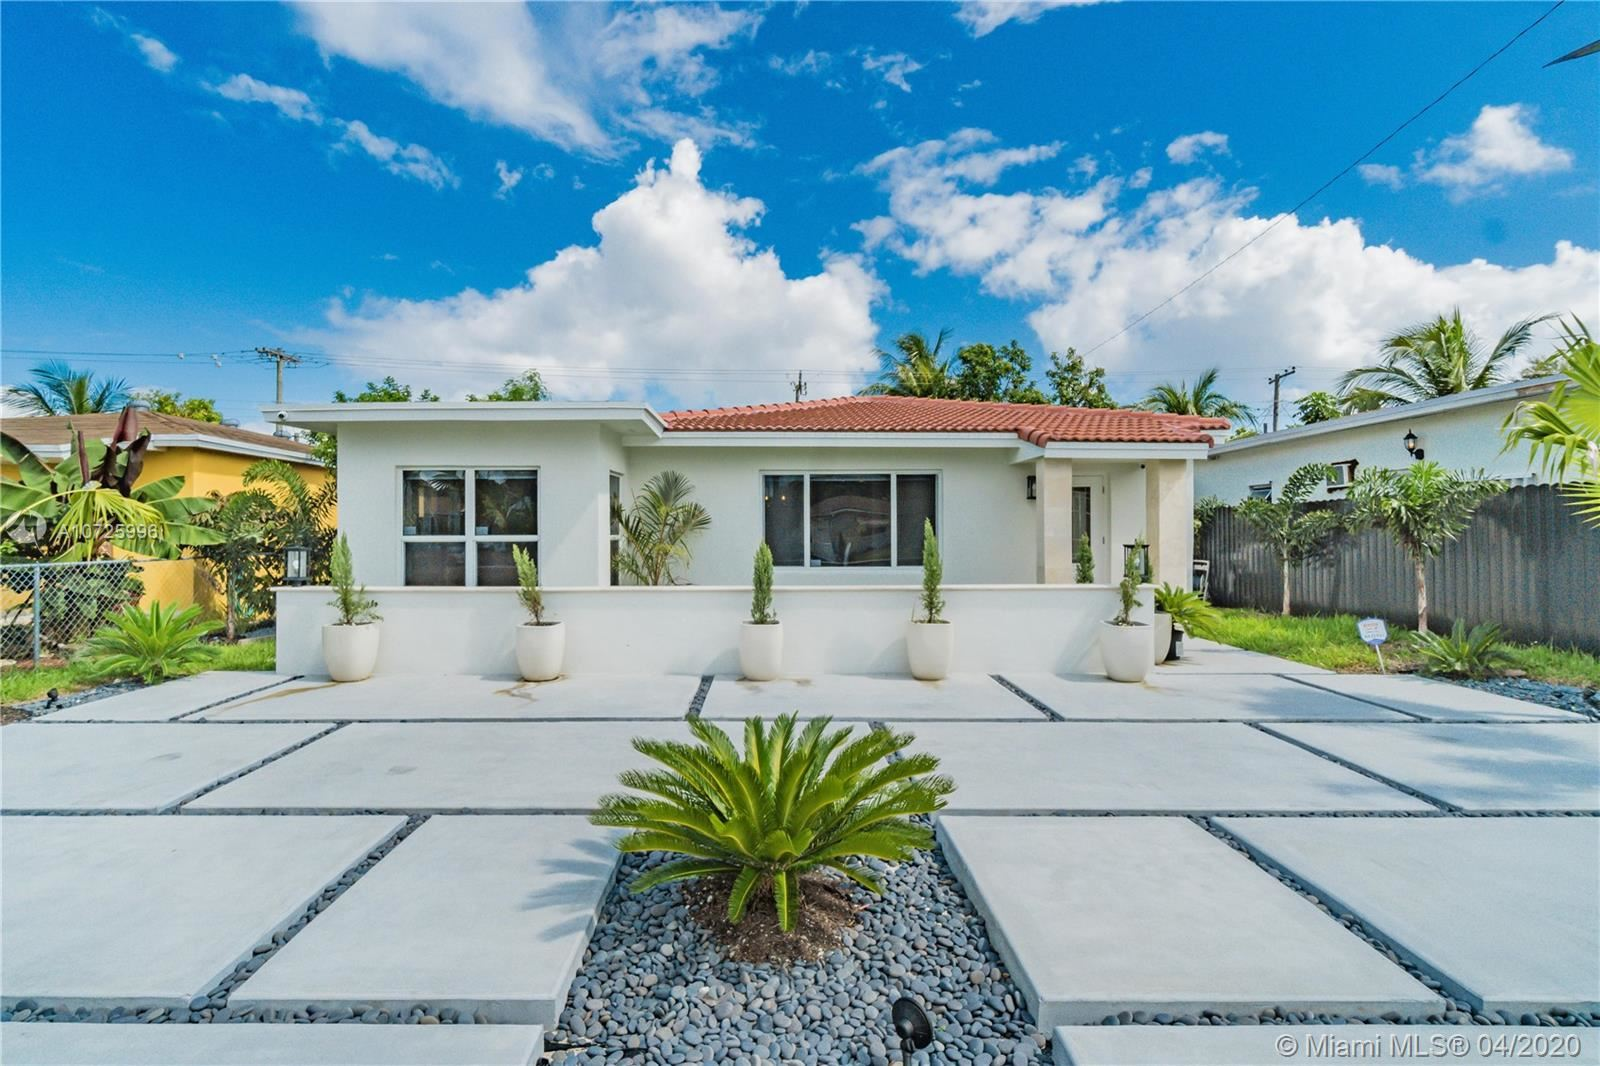 1731 NE 172nd St, North Miami Beach, FL 33162 - MLS#: A10725996